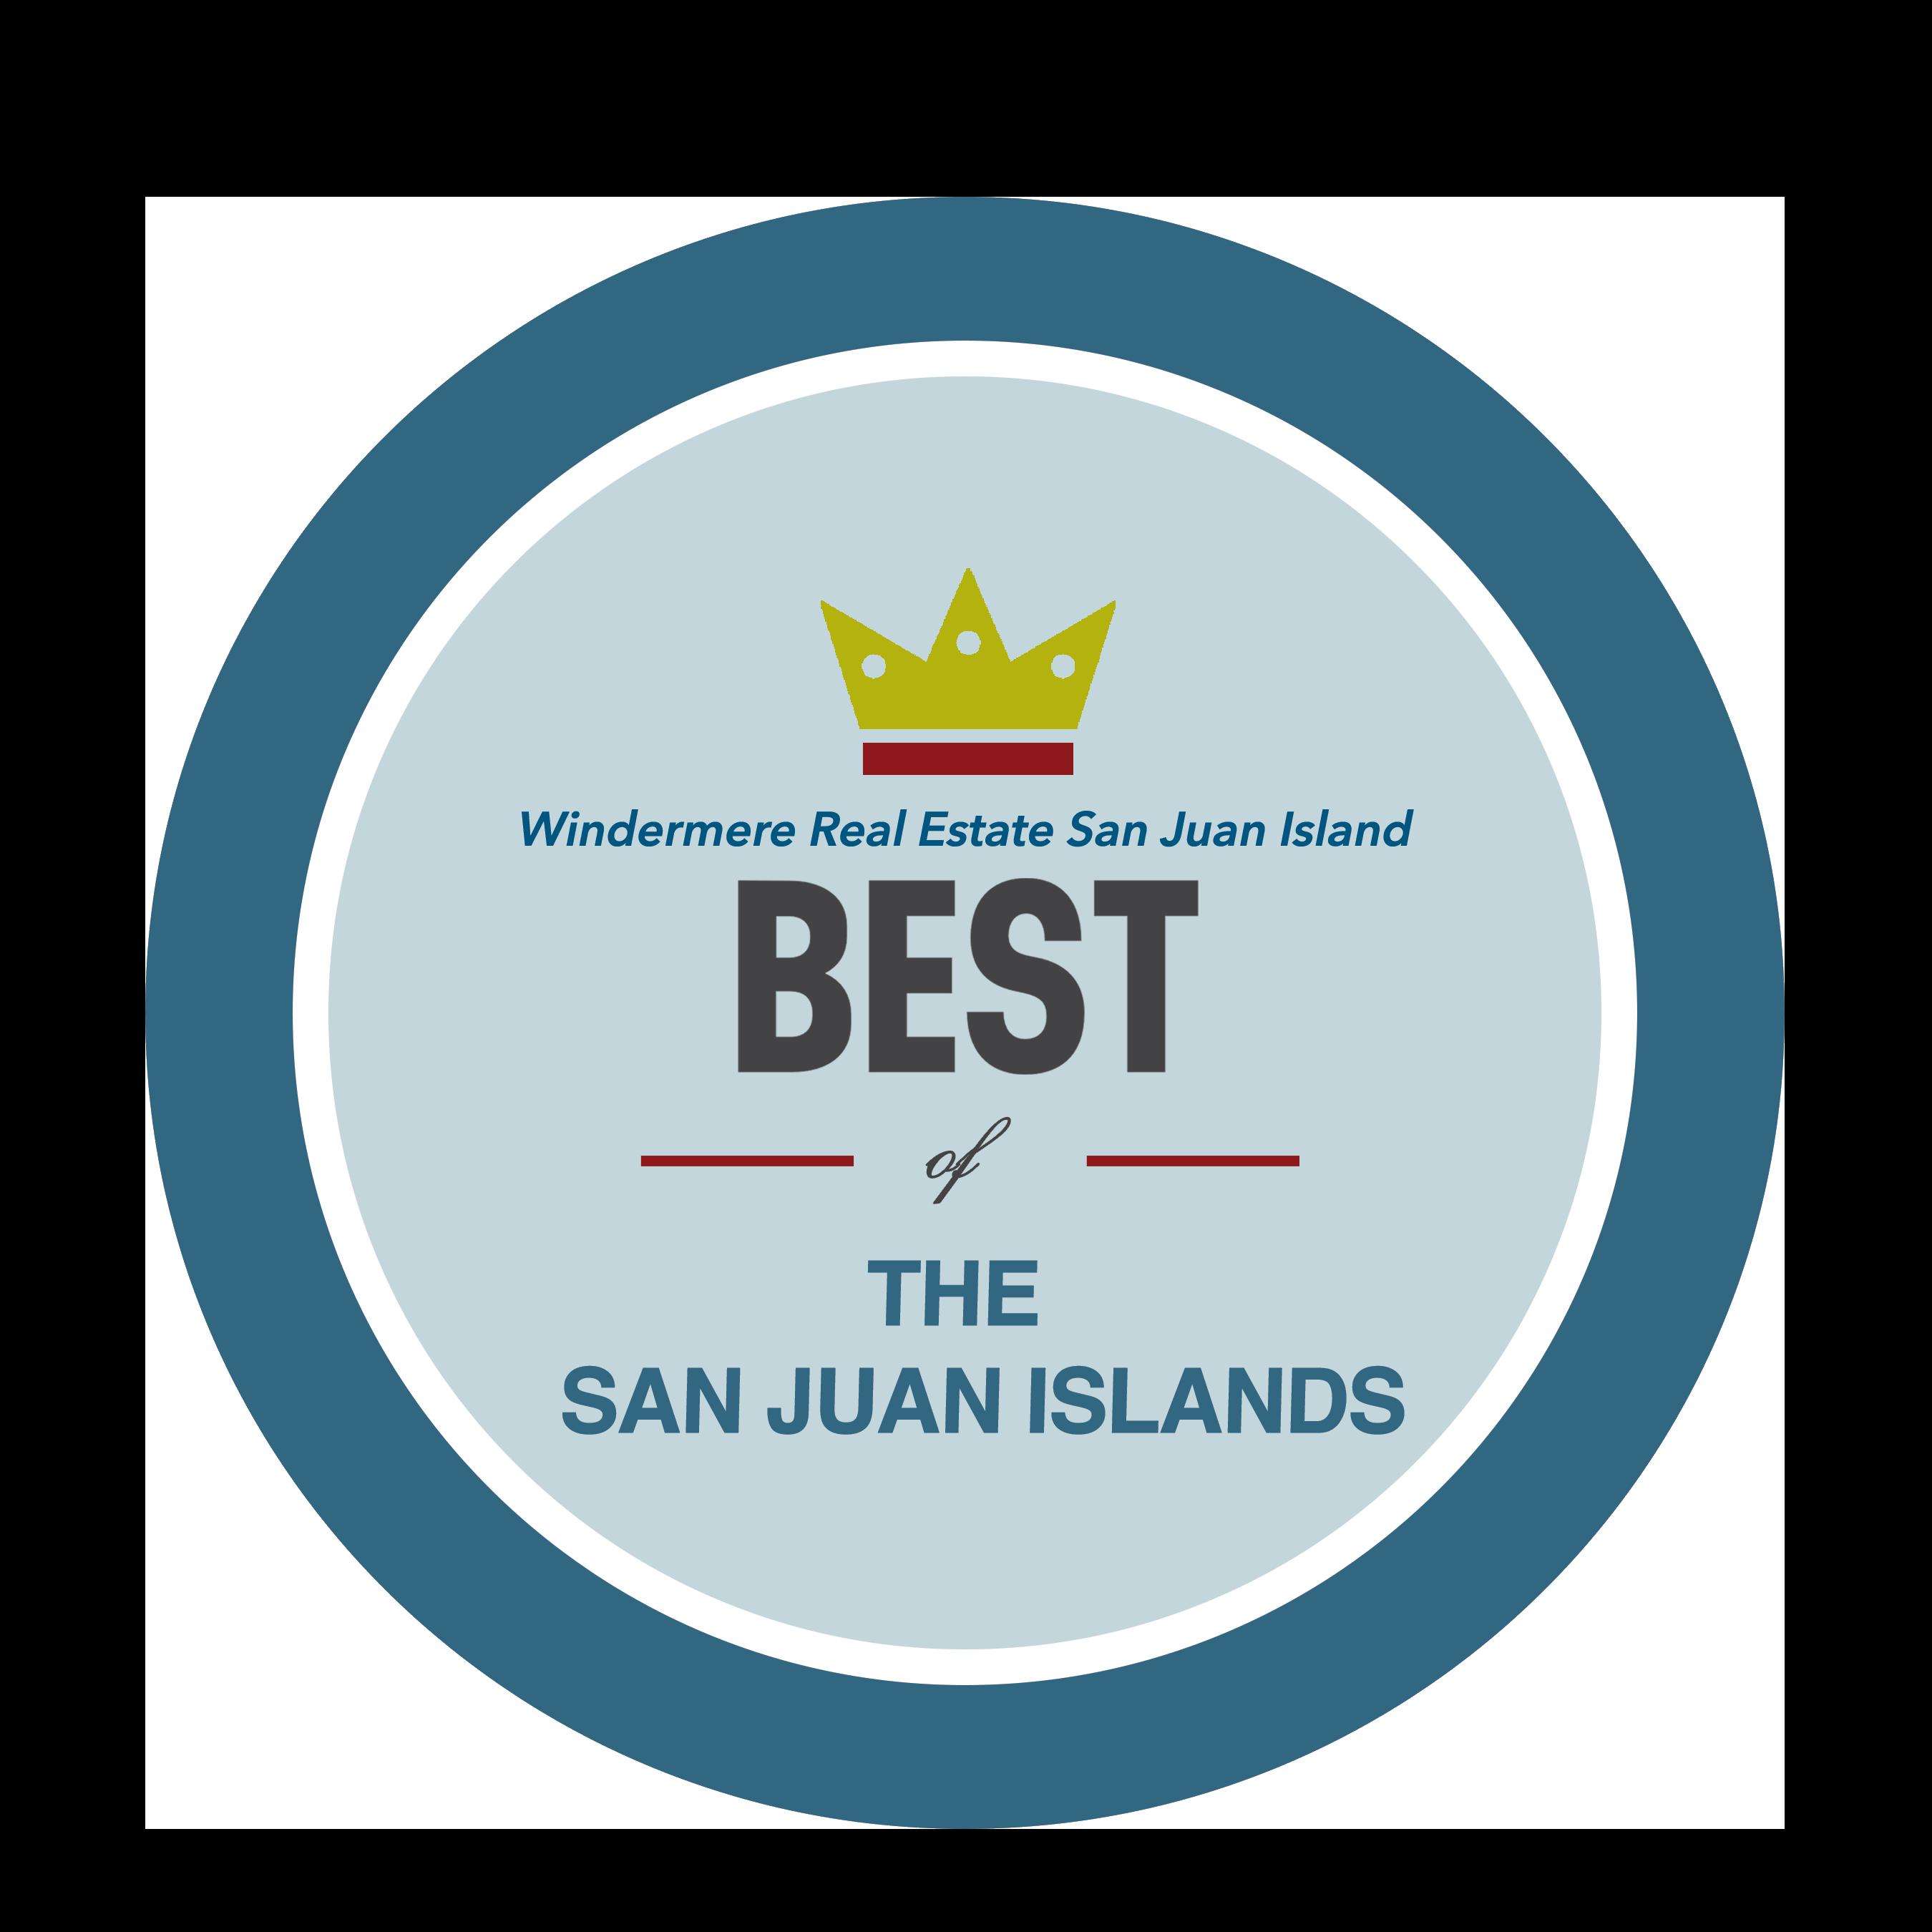 WINDERMERE REAL ESTATE SAN JUAN ISLAND Best Of THE SAN JUAN ISLANDS NO DATE